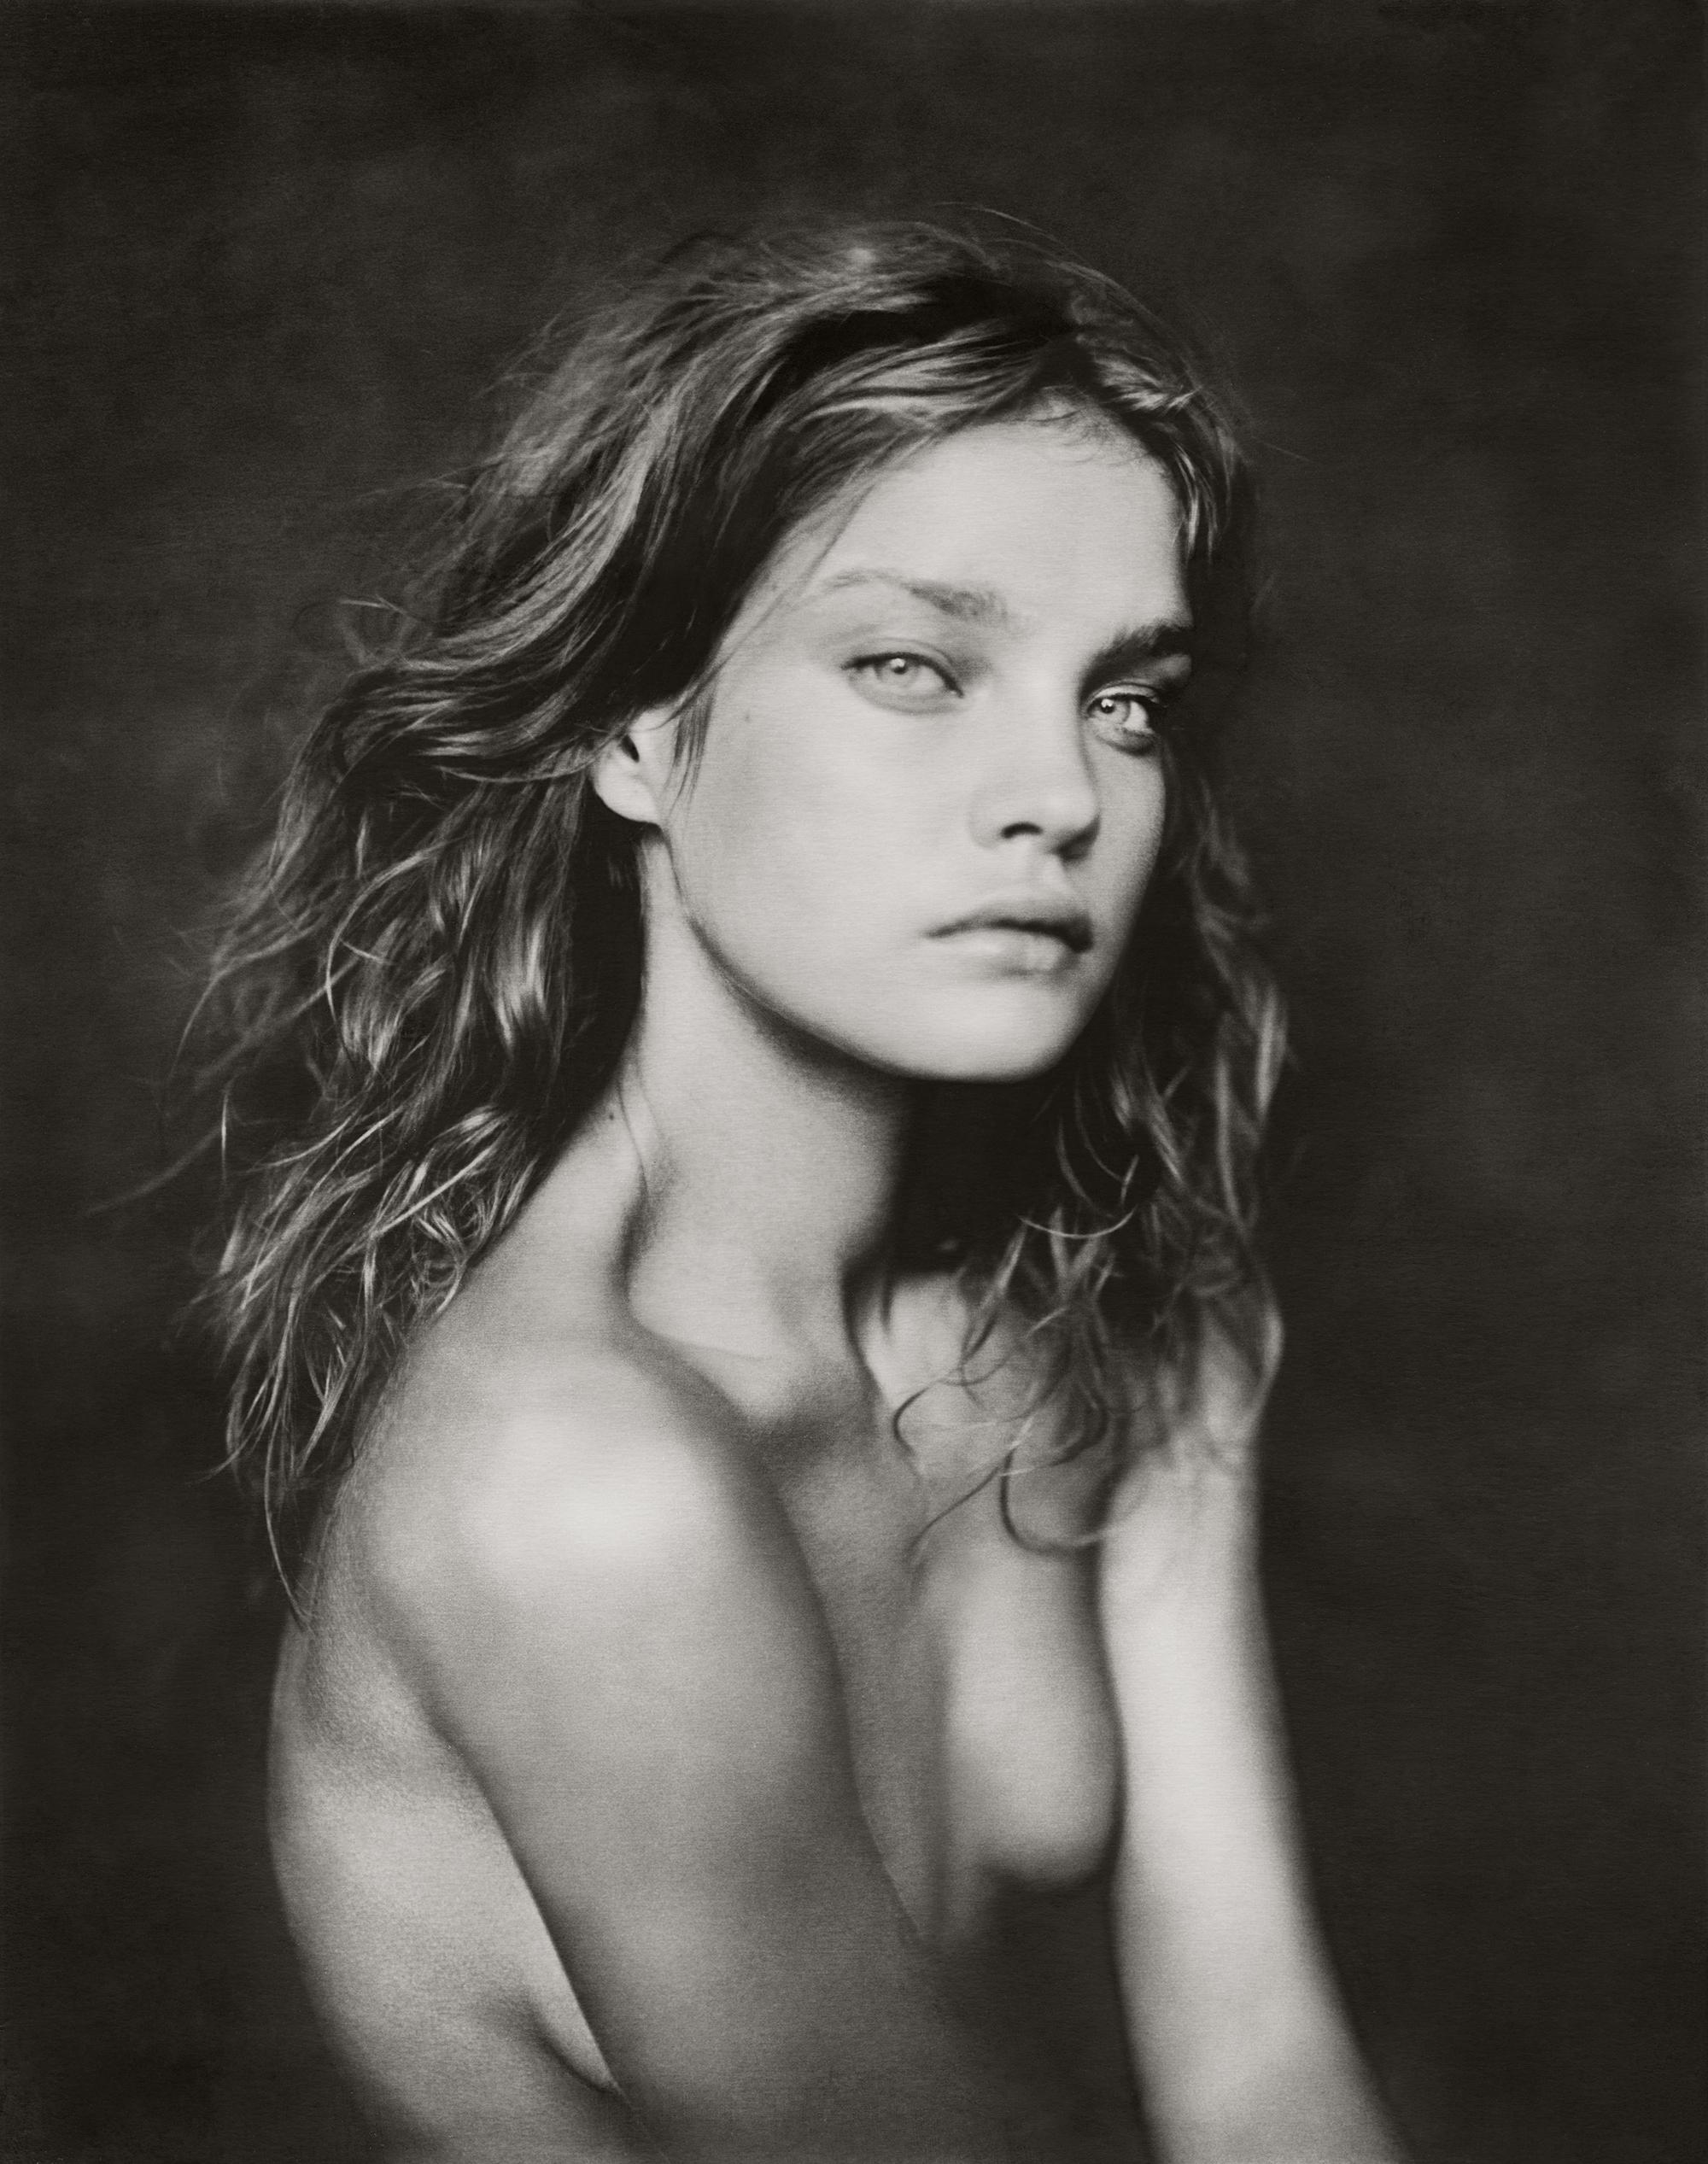 Natalia Vodianova for Egoïste, Paris 2003.